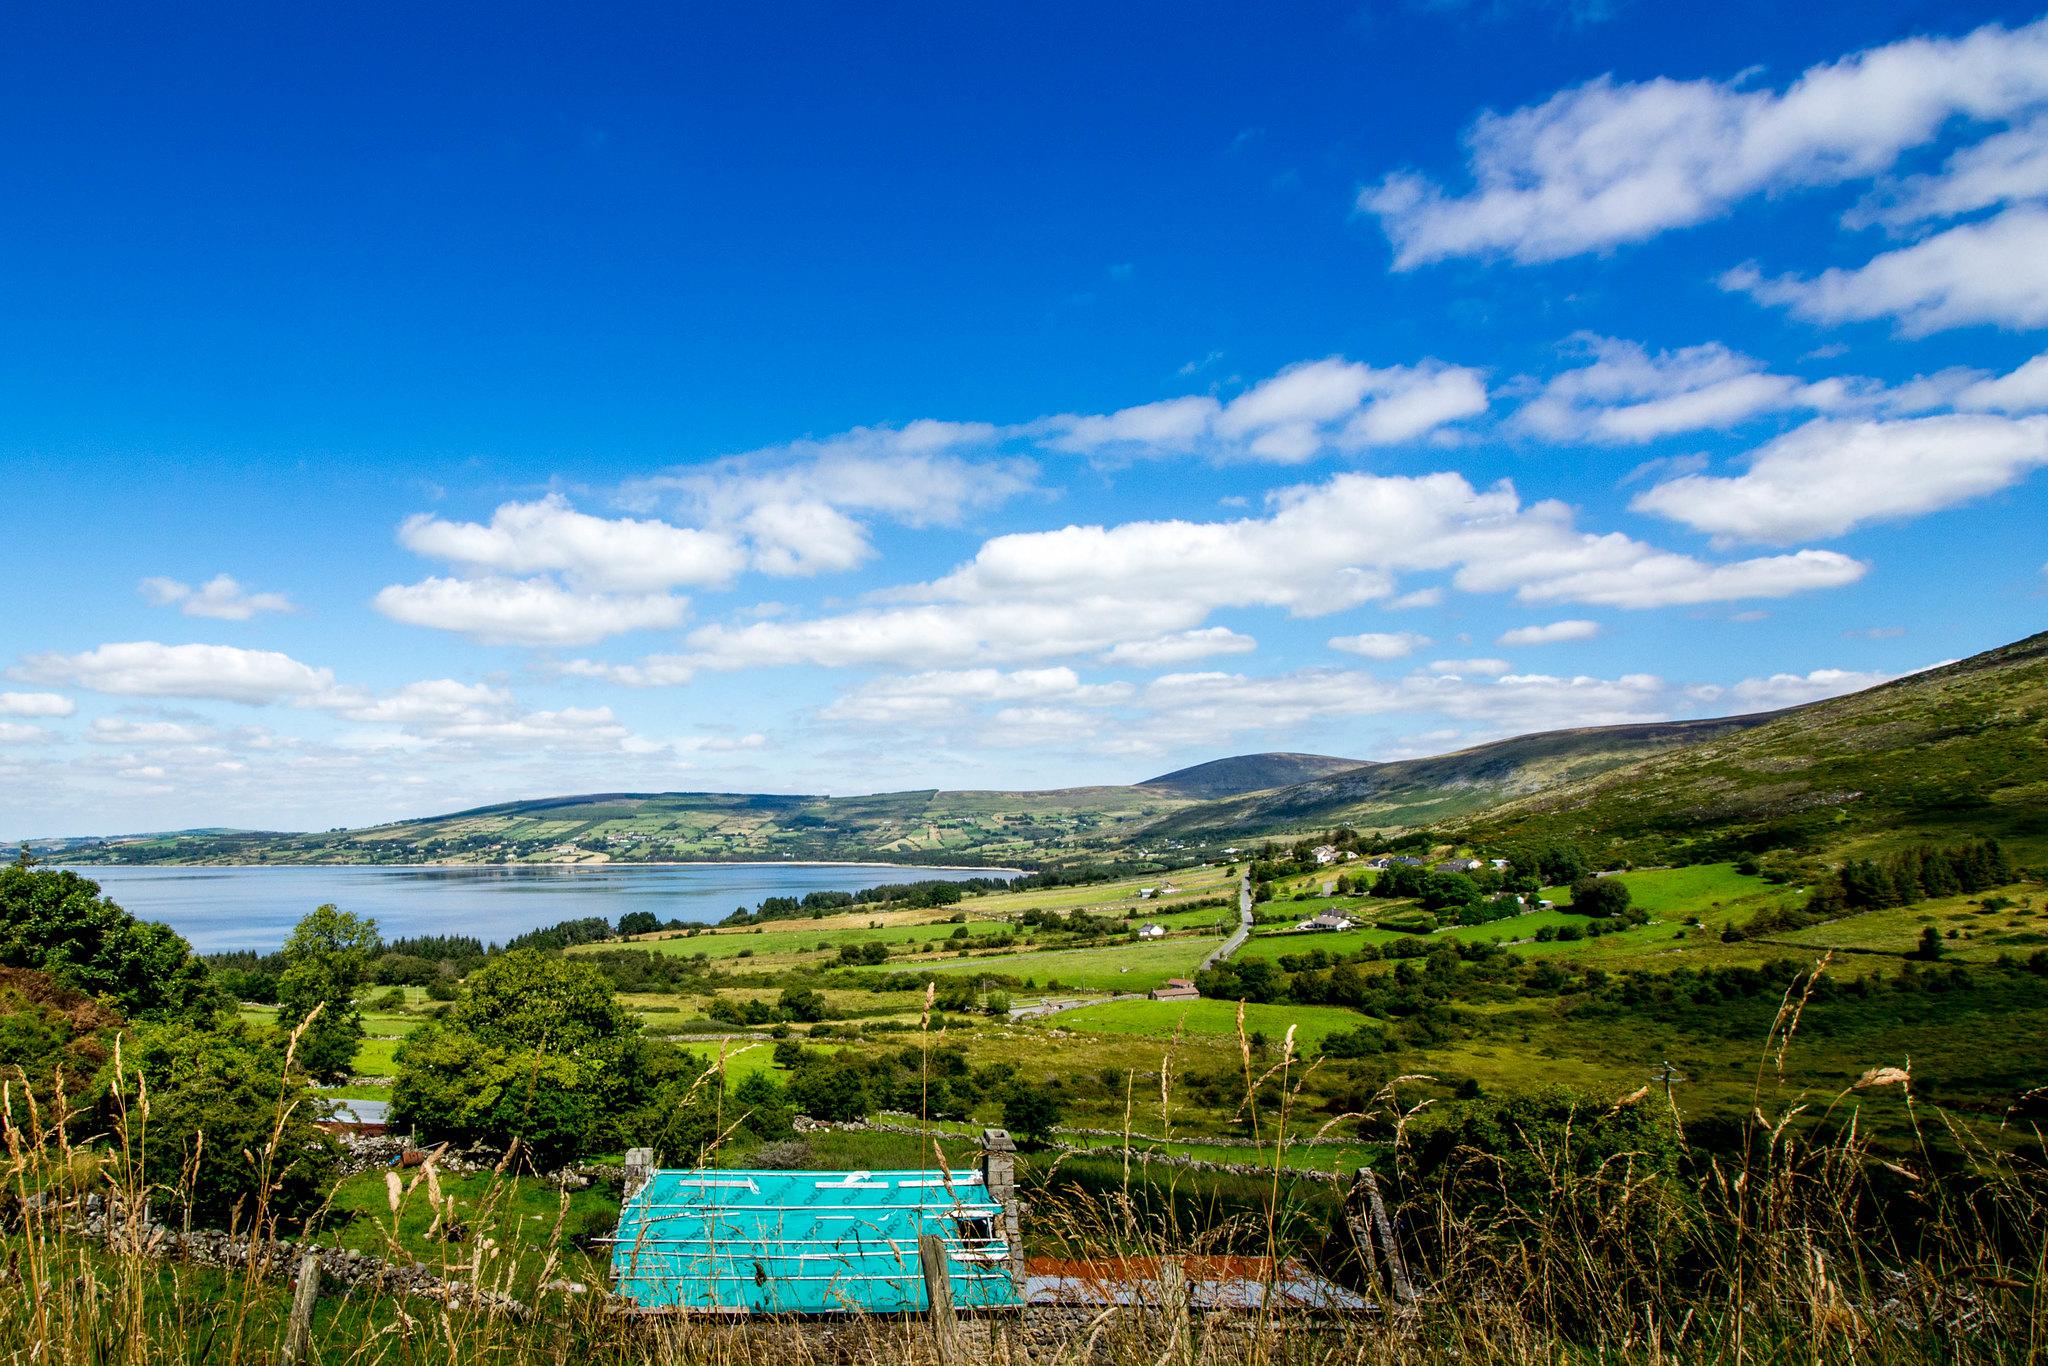 A slice of lakeside life - The Irish Times